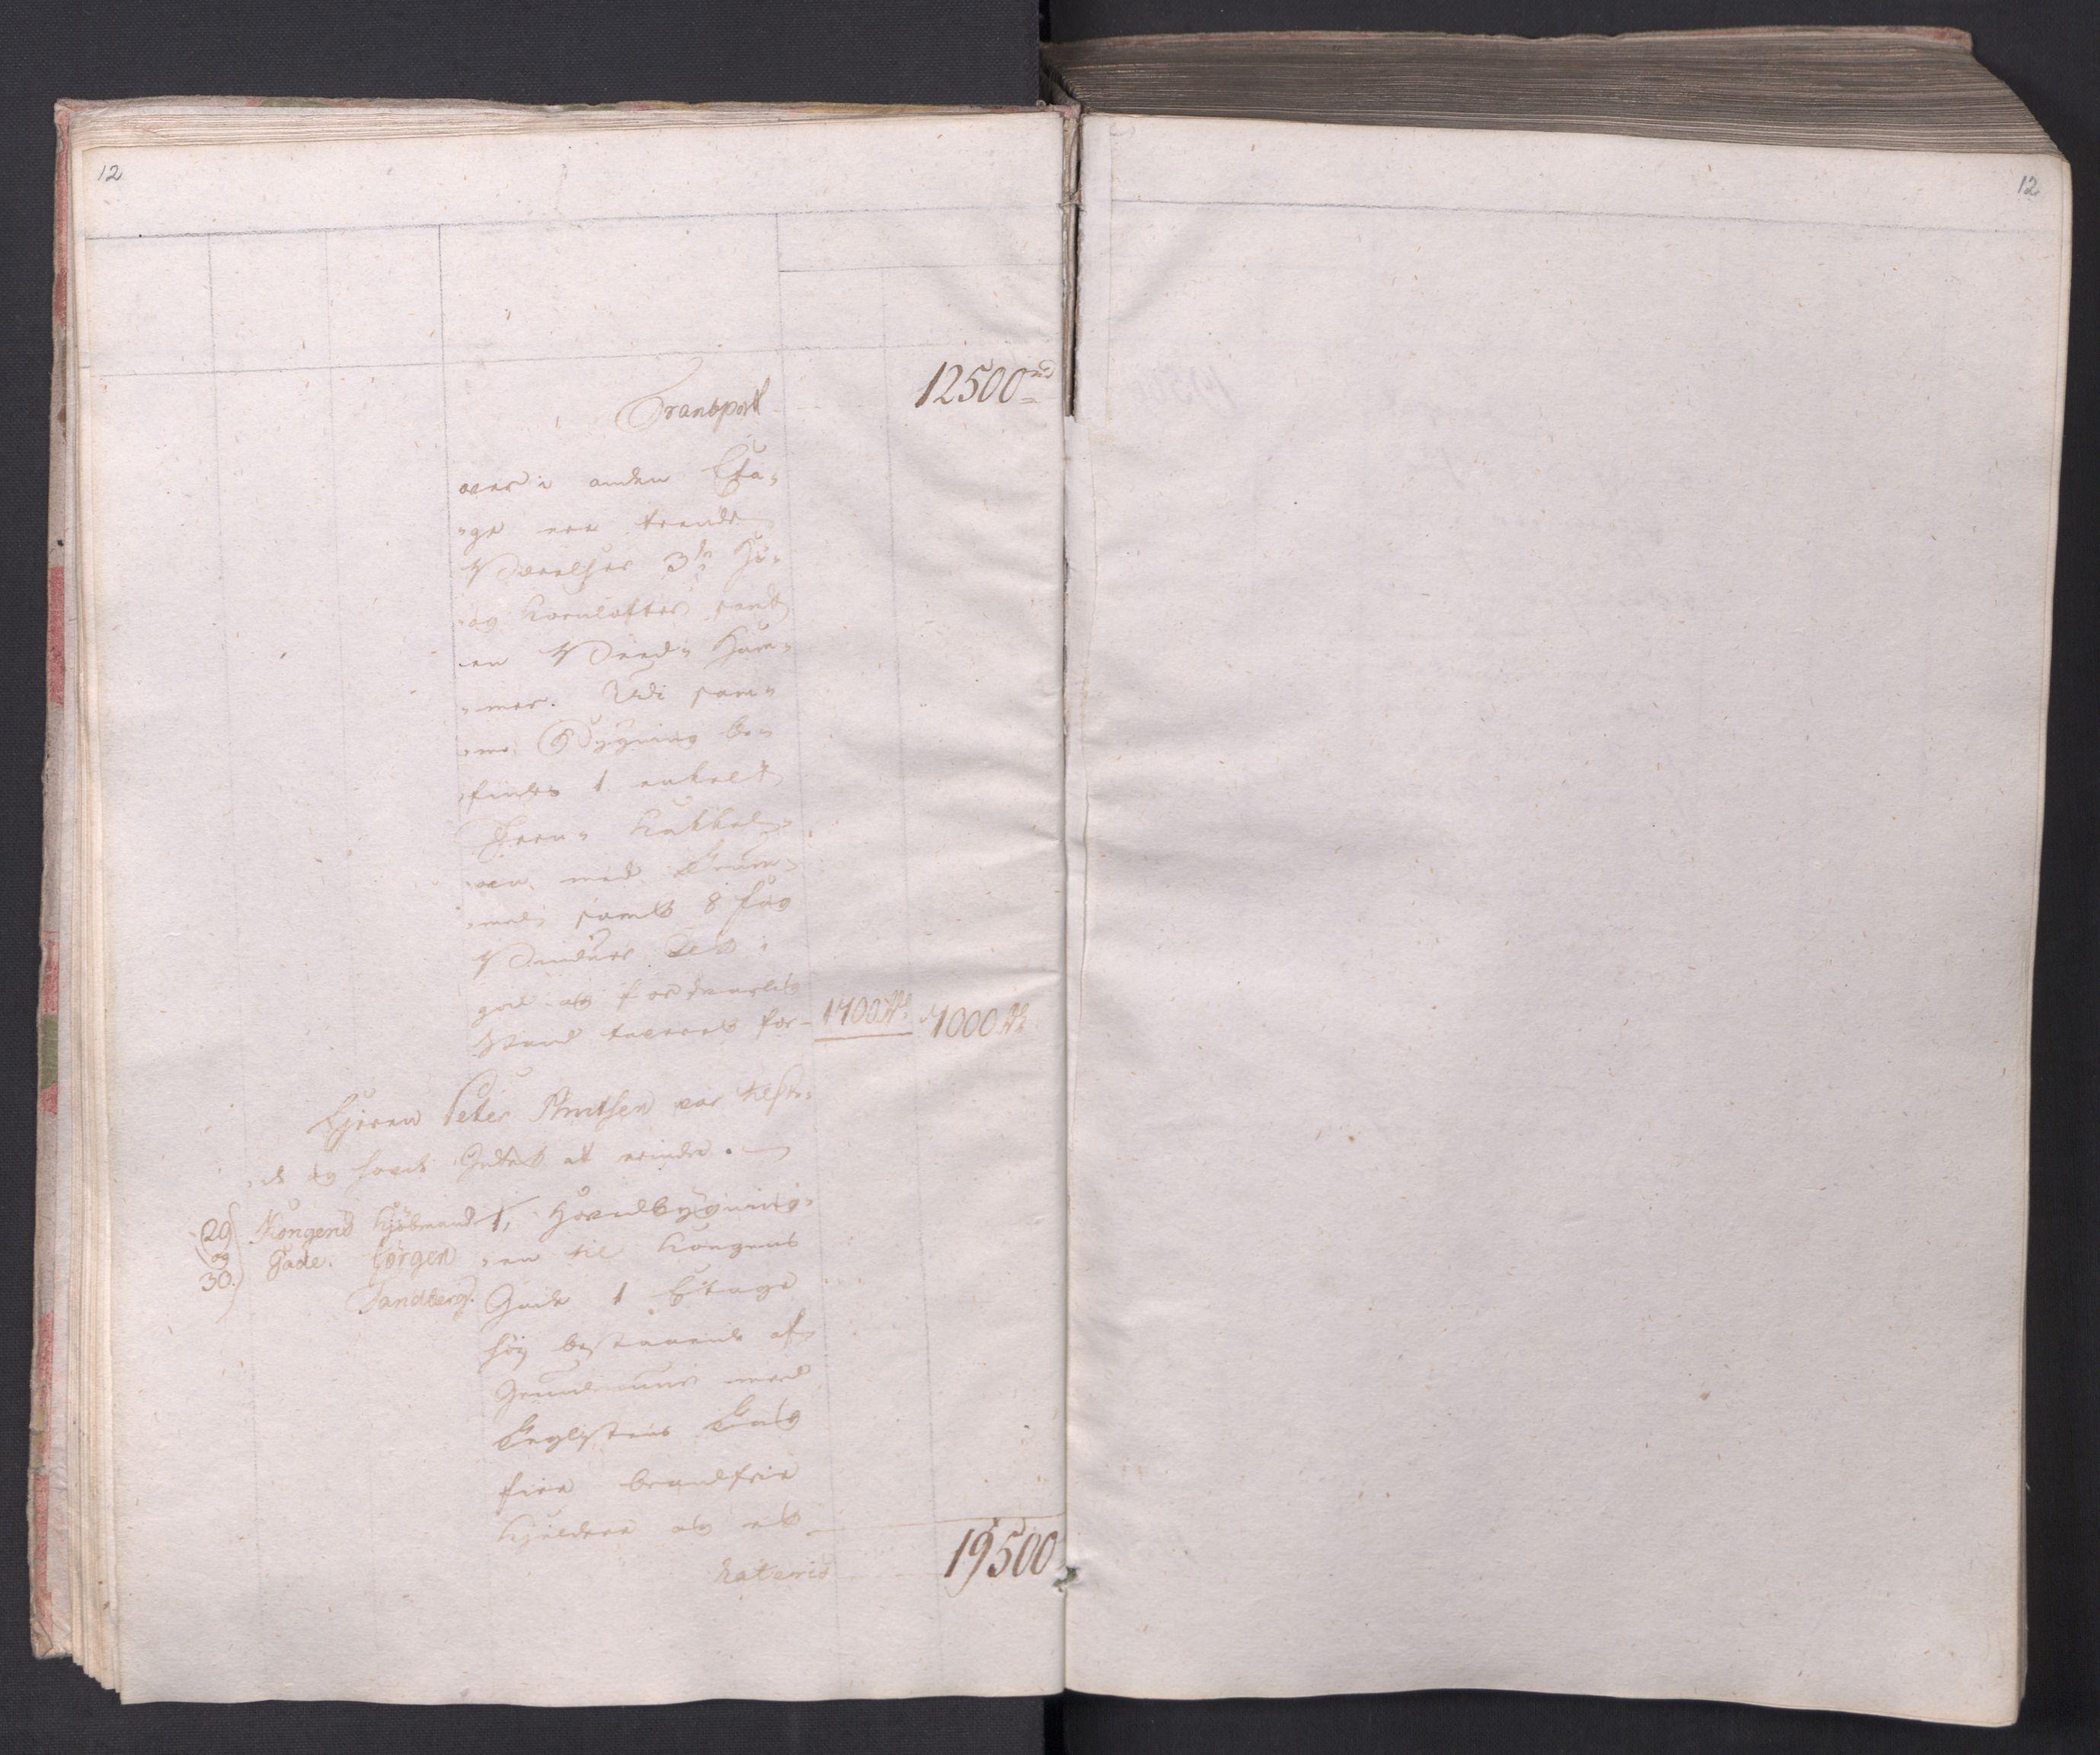 SAO, Kristiania stiftamt, I/Ia/L0015: Branntakster, 1797, s. 12